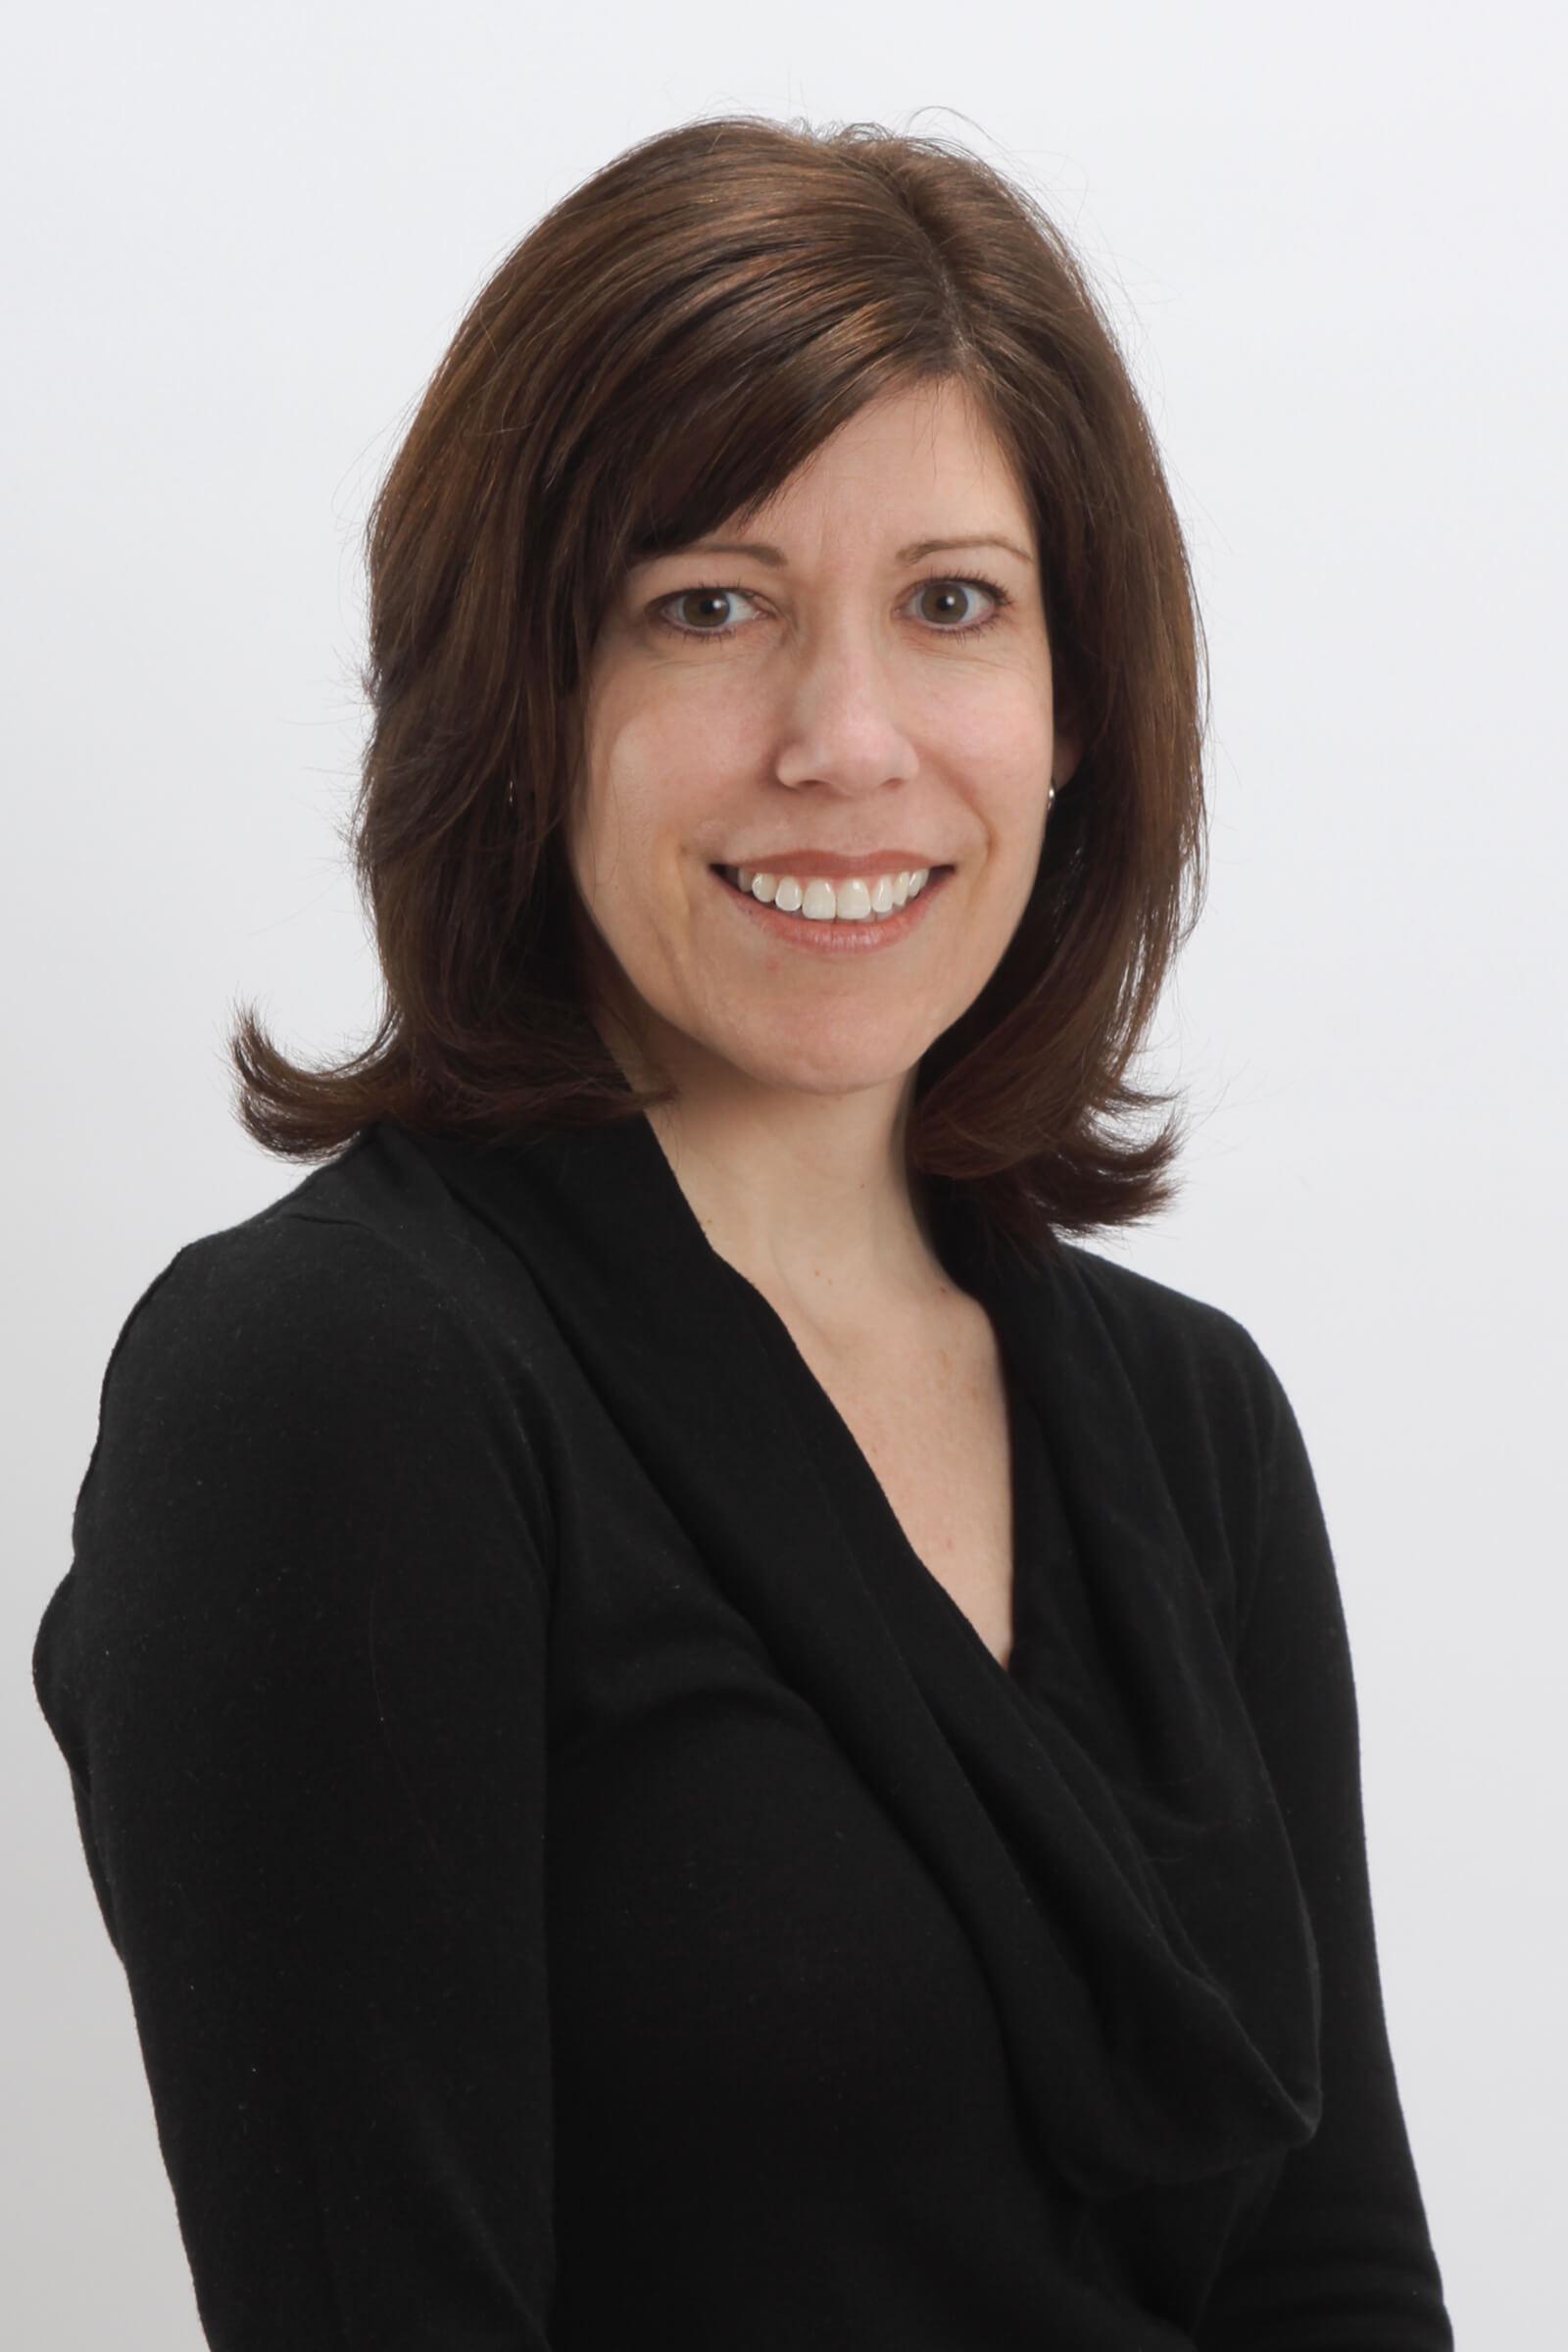 April Moran, MSW, LCSW-C